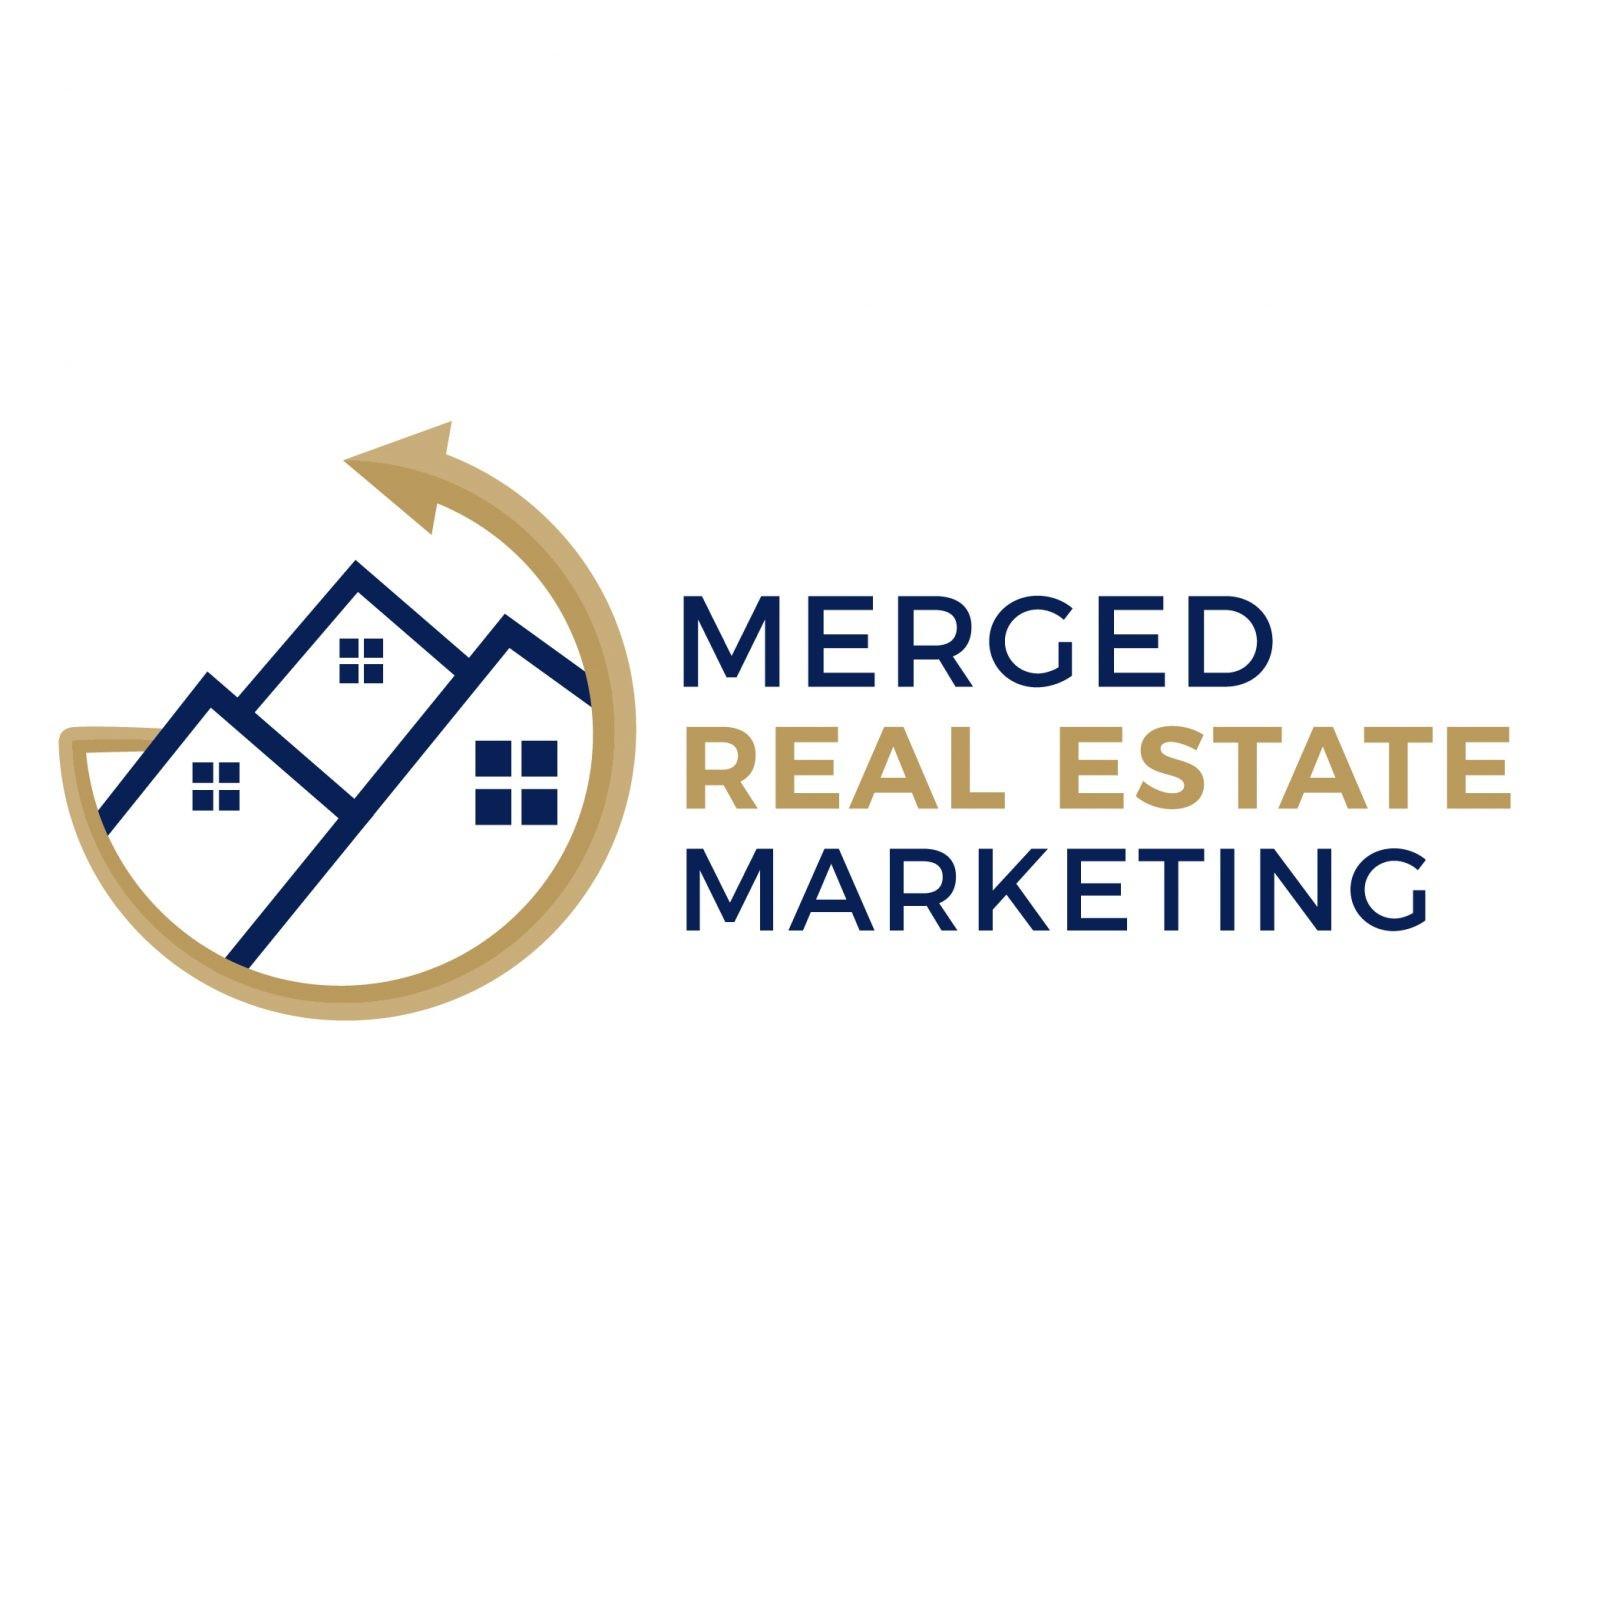 Merged Real Estate Marketing - REMS Sponsor